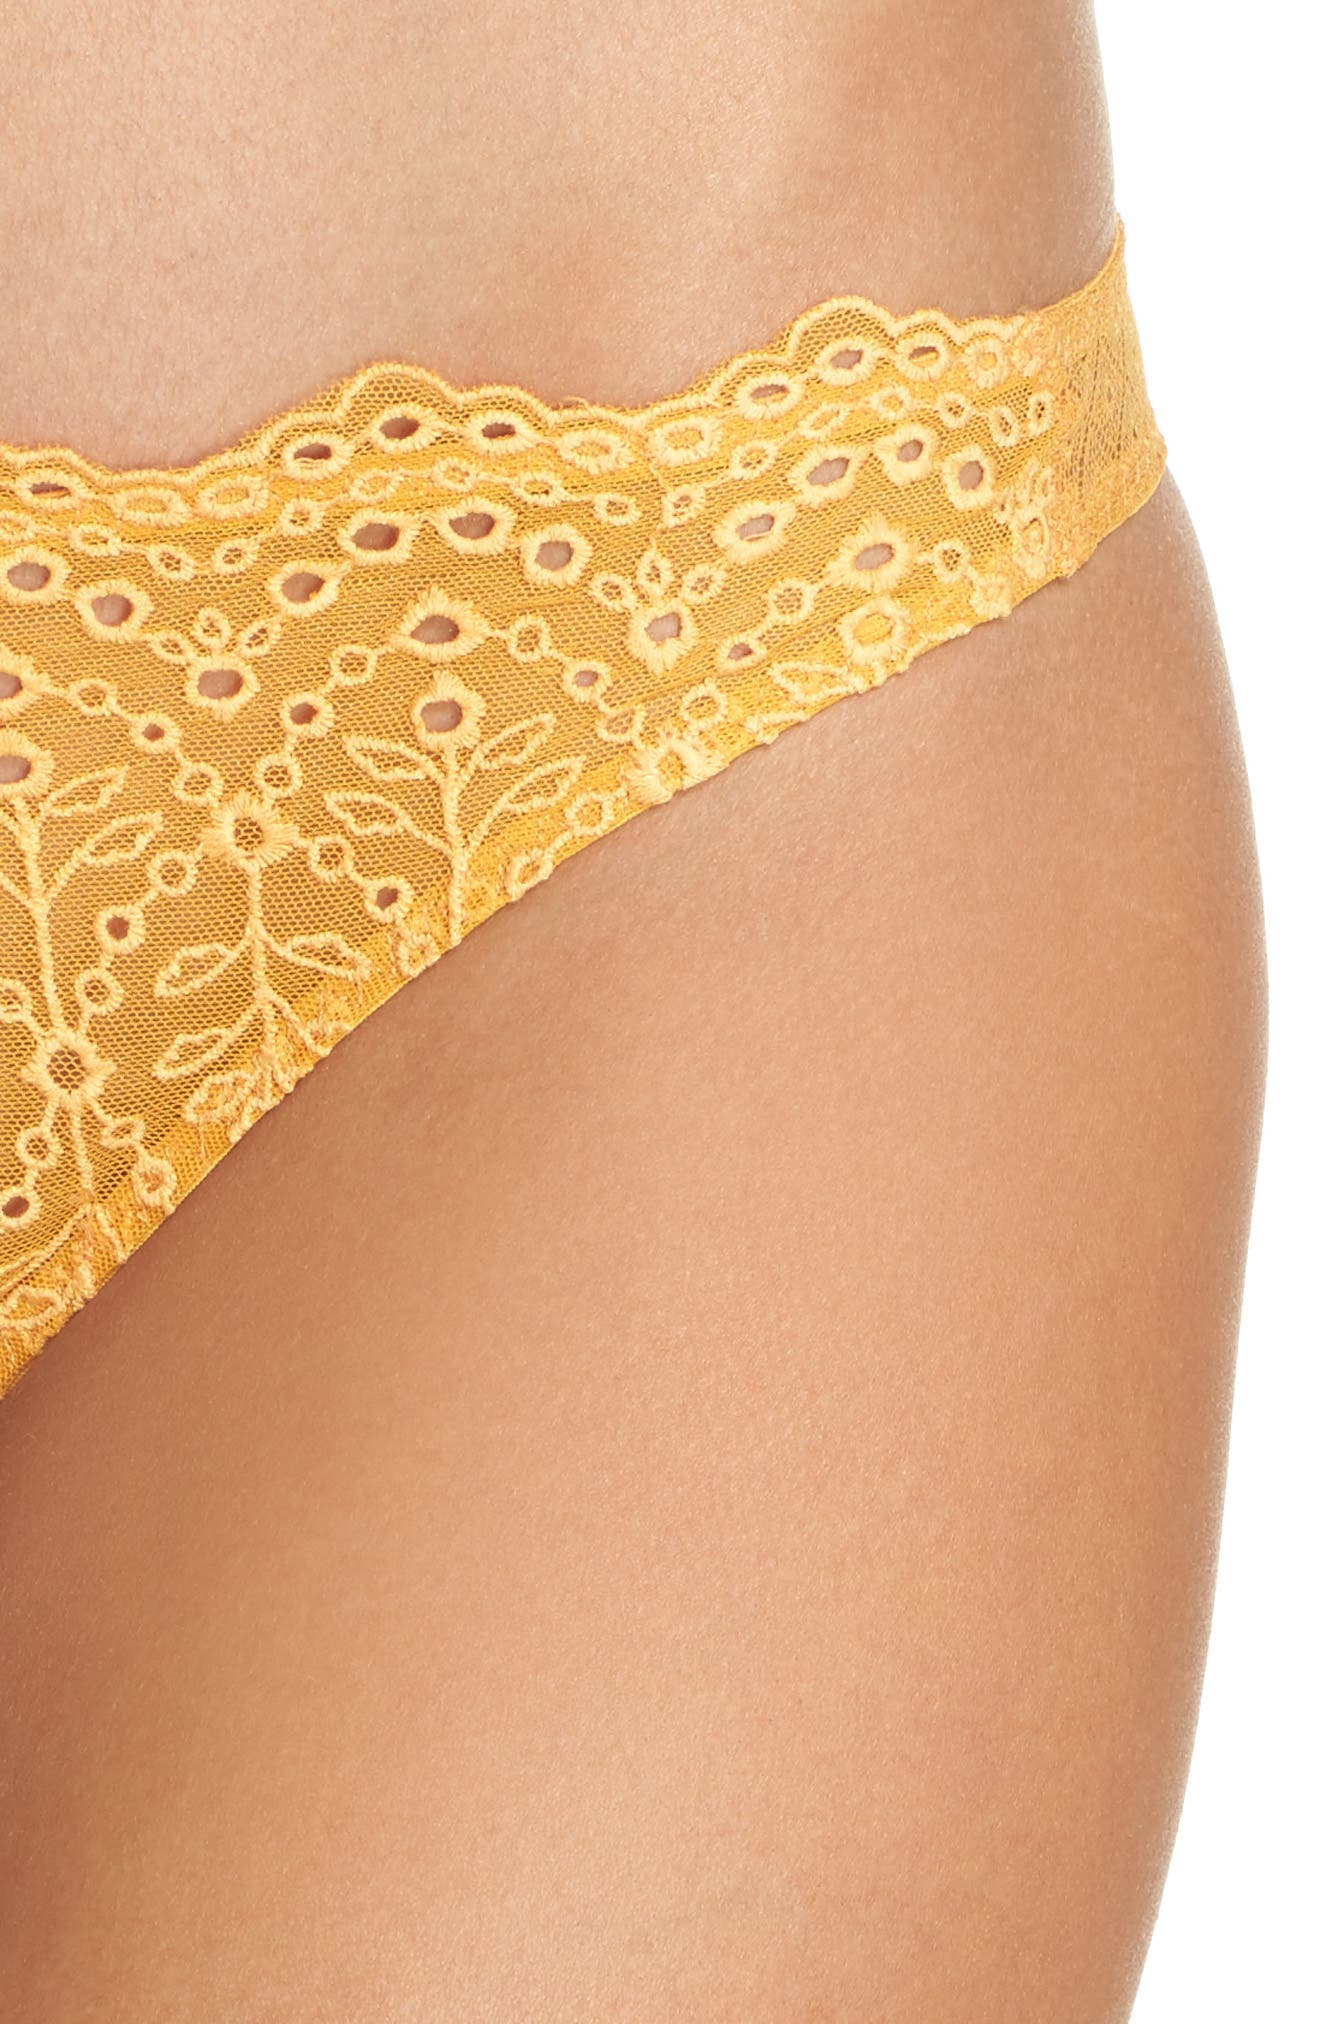 Intimately FP St. Tropez Tanga Panties,                             Alternate thumbnail 8, color,                             Yellow